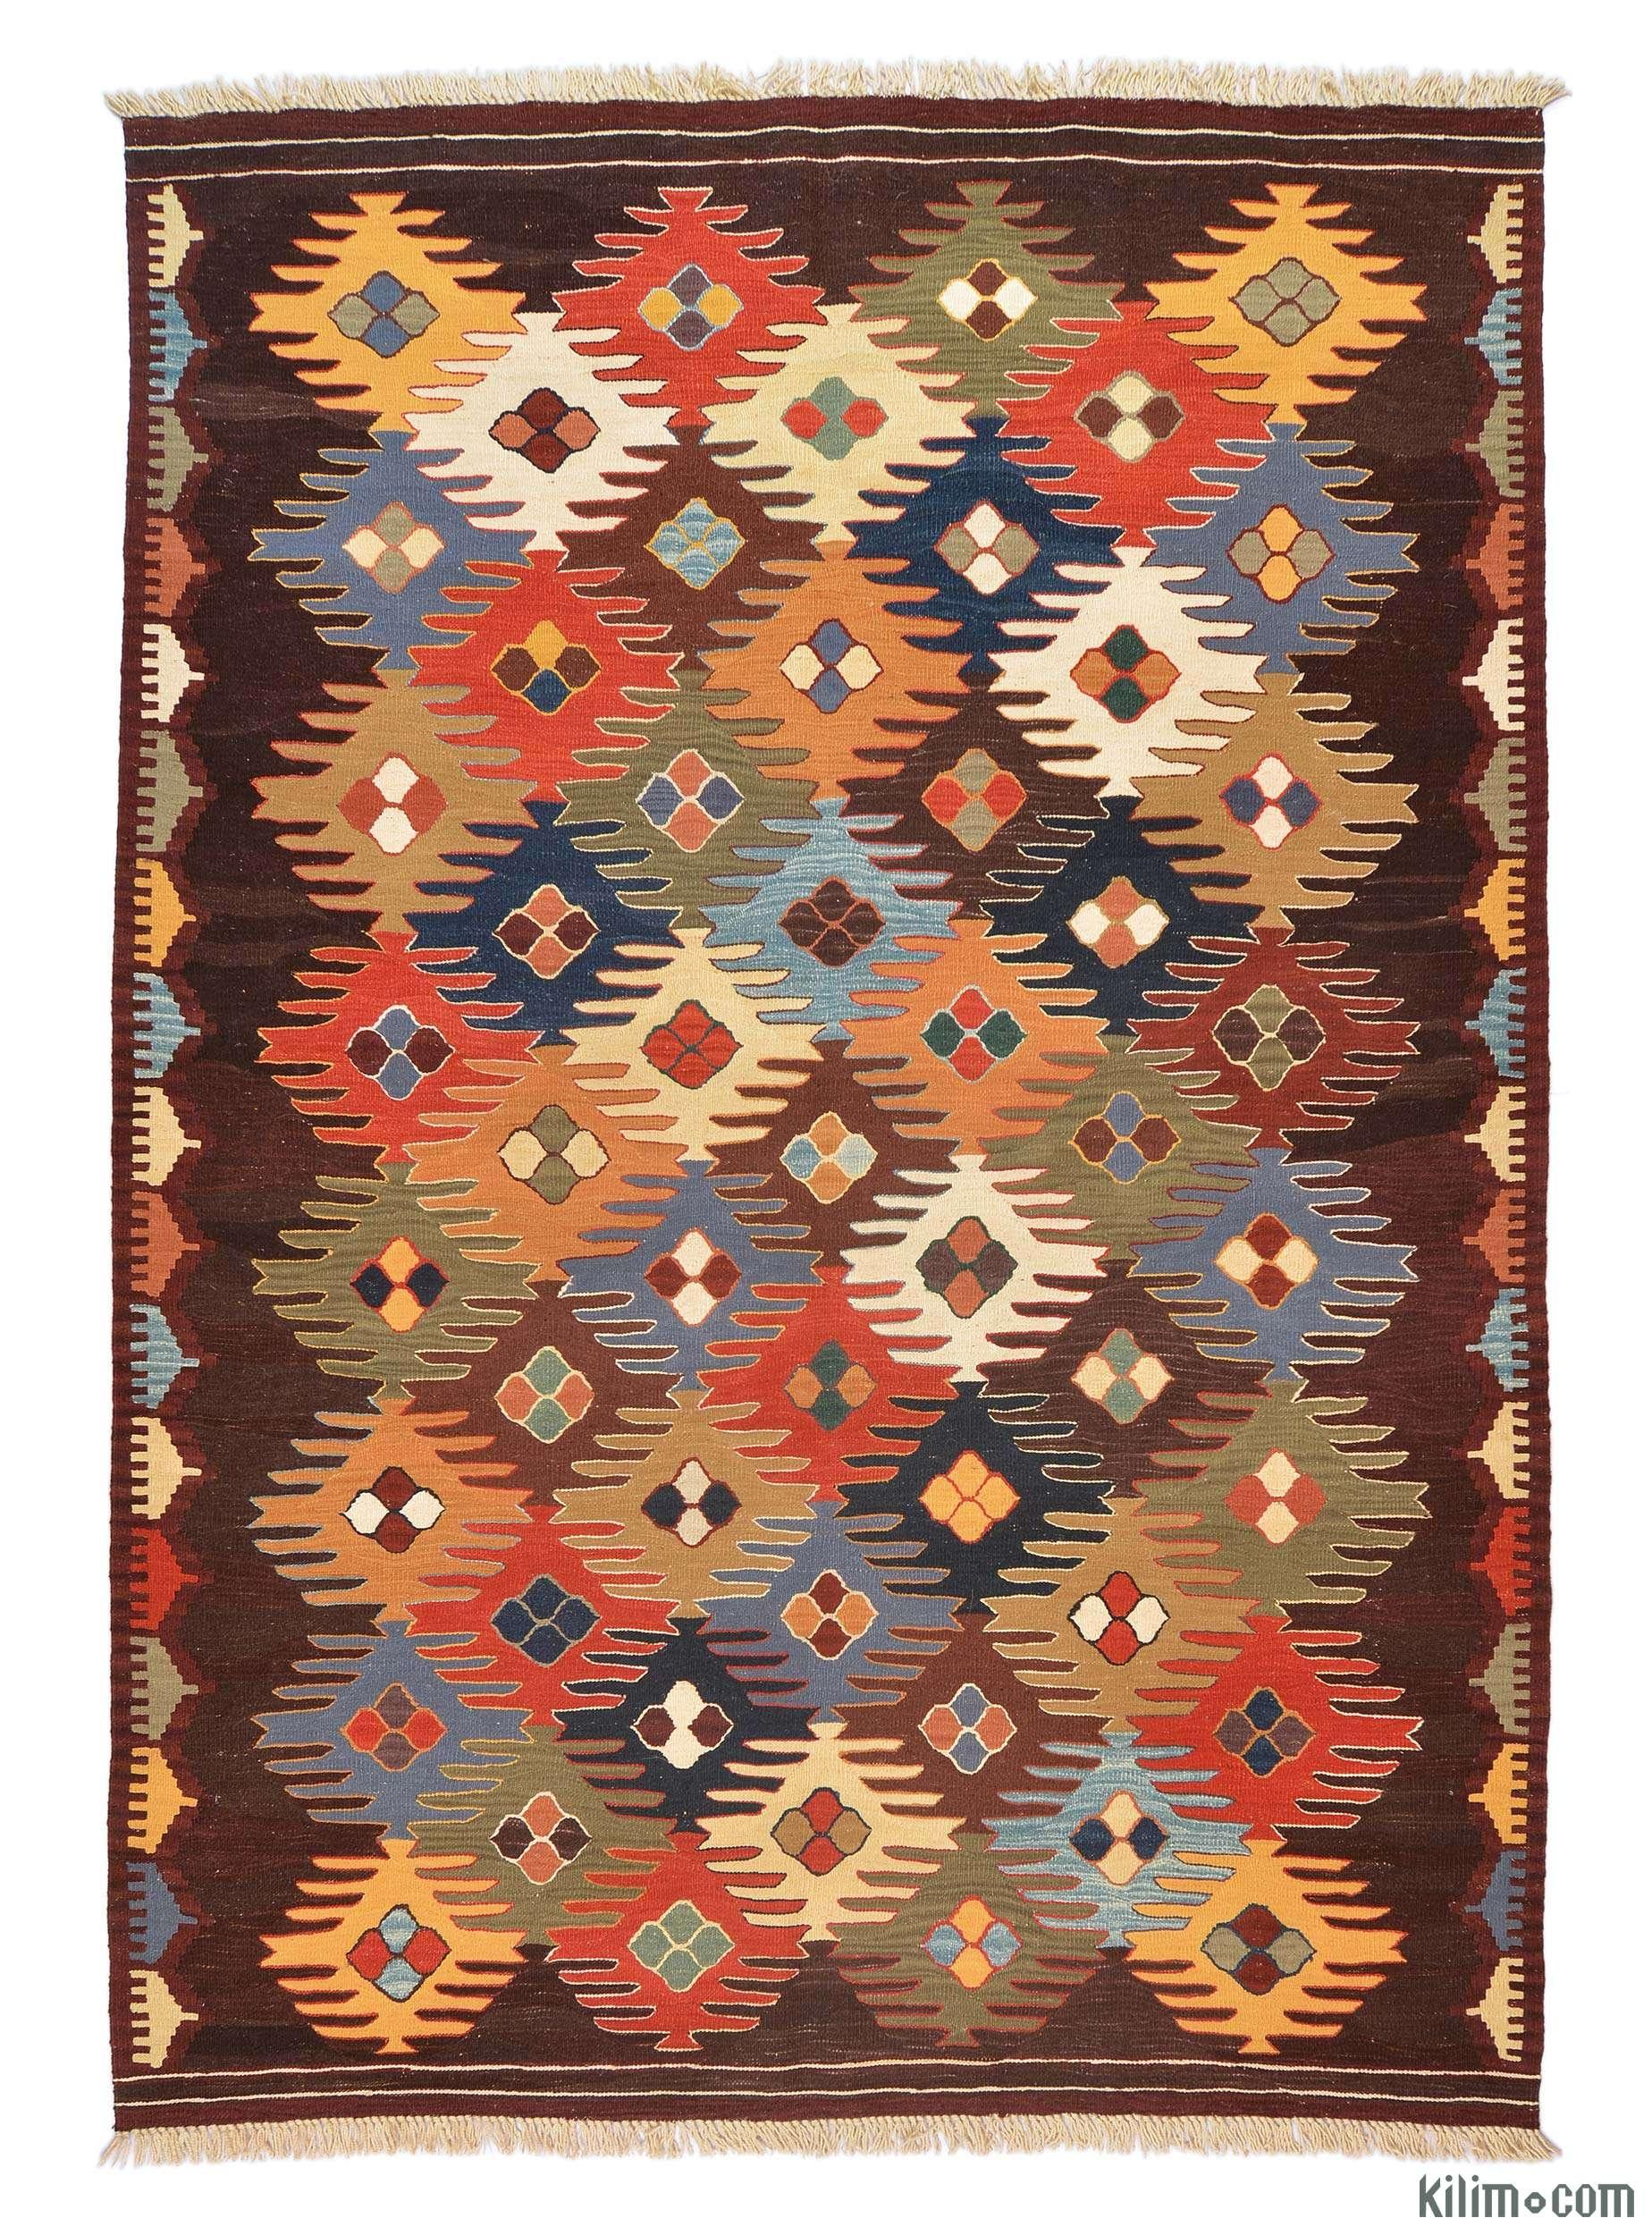 K0005789 Multicolor New Turkish Kilim Rug Kilim Rugs Overdyed Inside Turkish Kilim Rugs (Image 6 of 15)